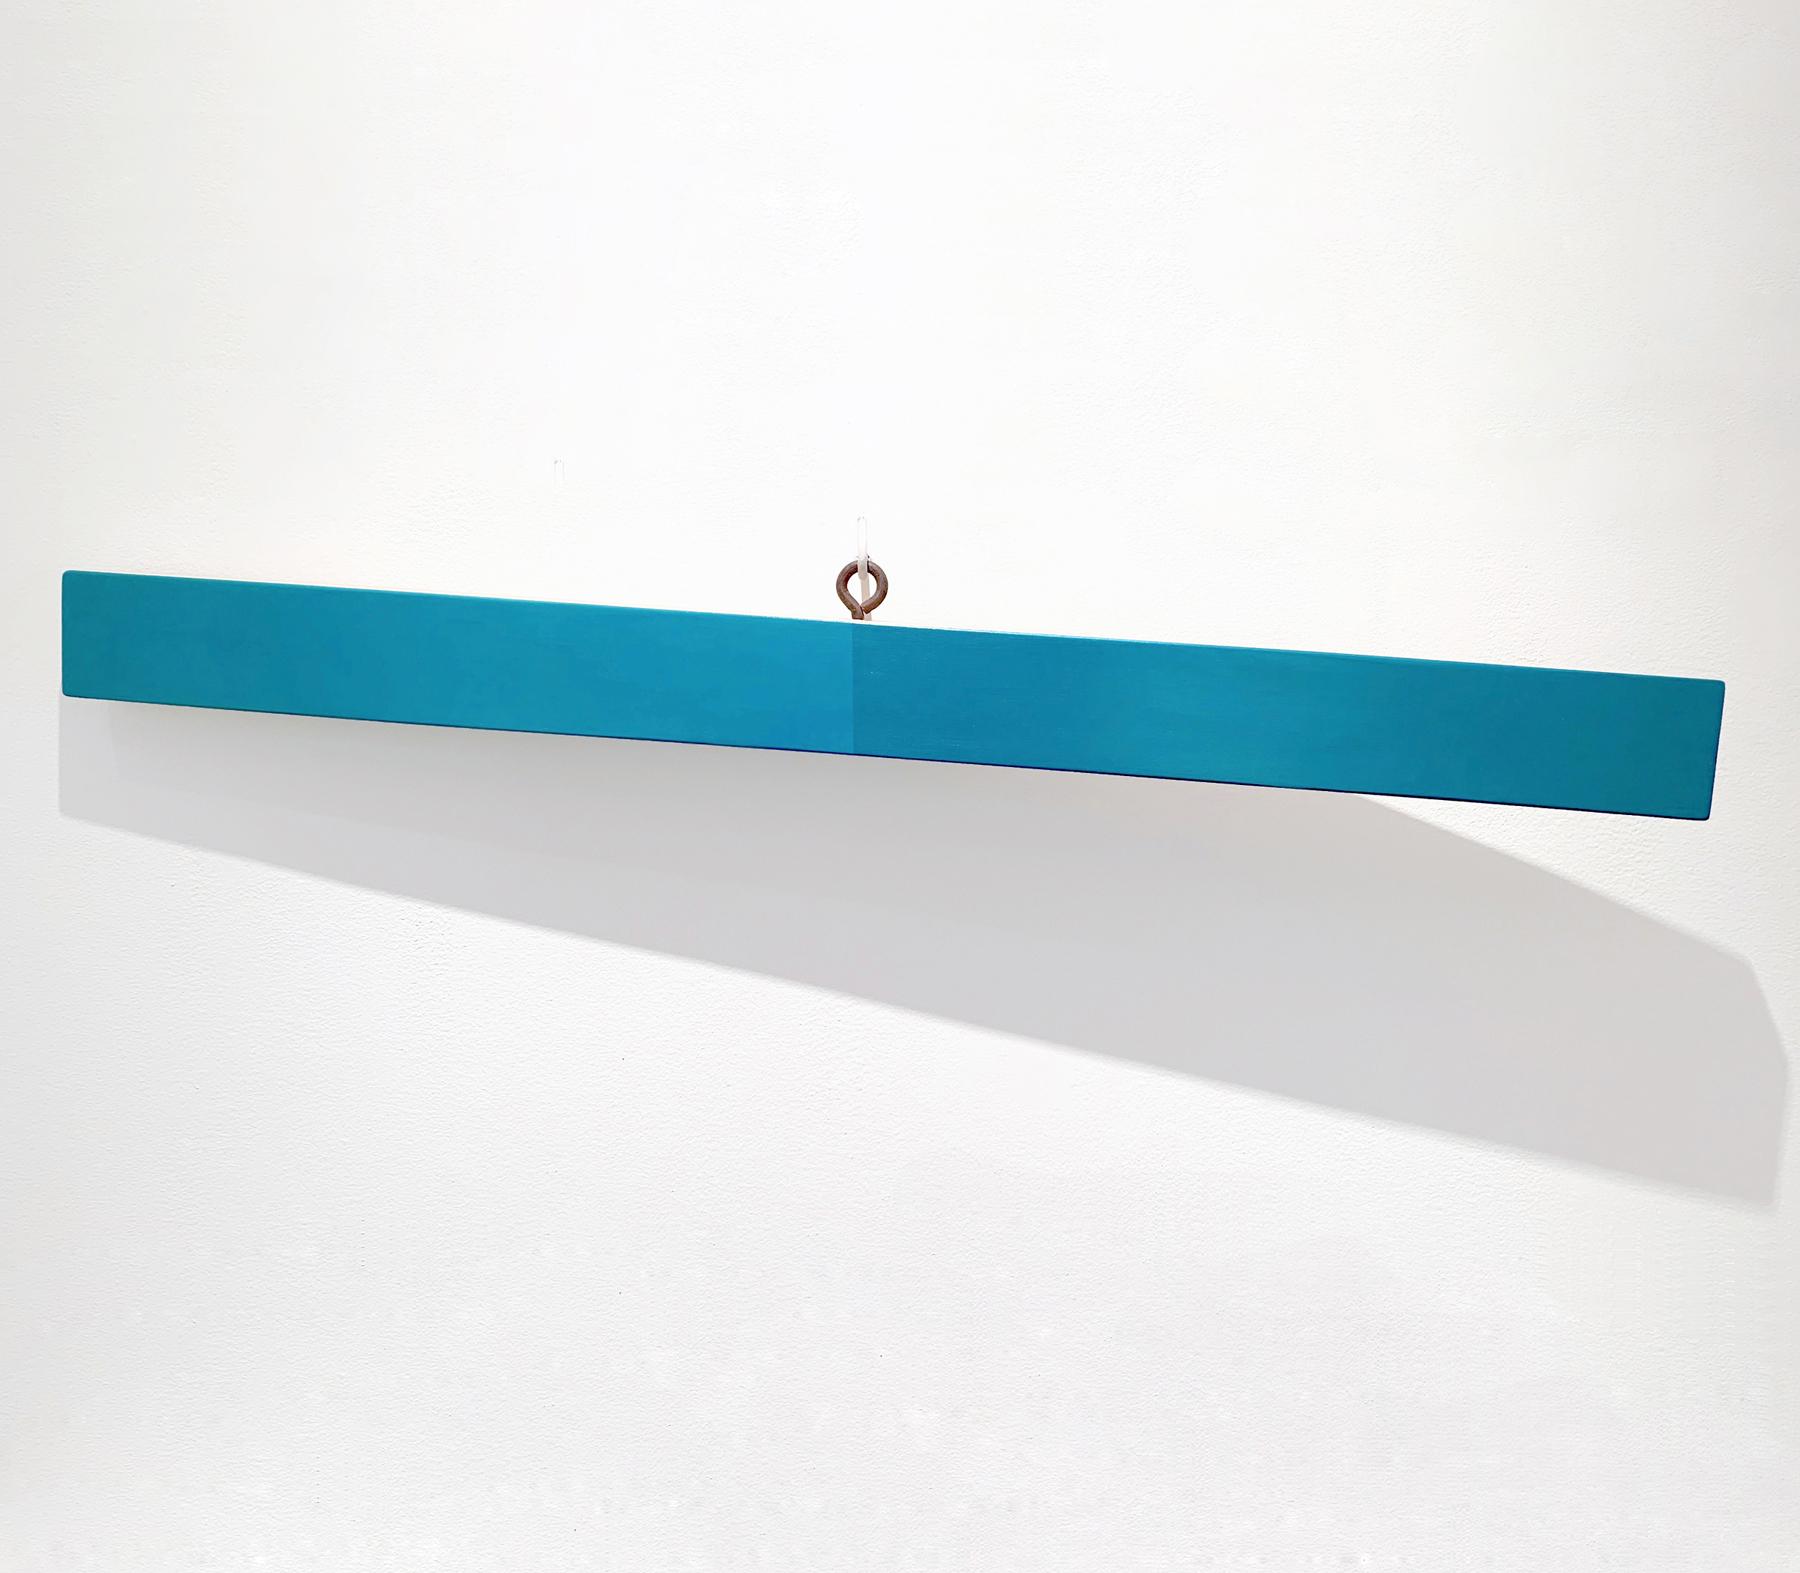 Lost and Found #3, 5.5 x 45.25 x 3 inches / 14 x 115 x 7.5 cm, acrylic on poplar, 2019